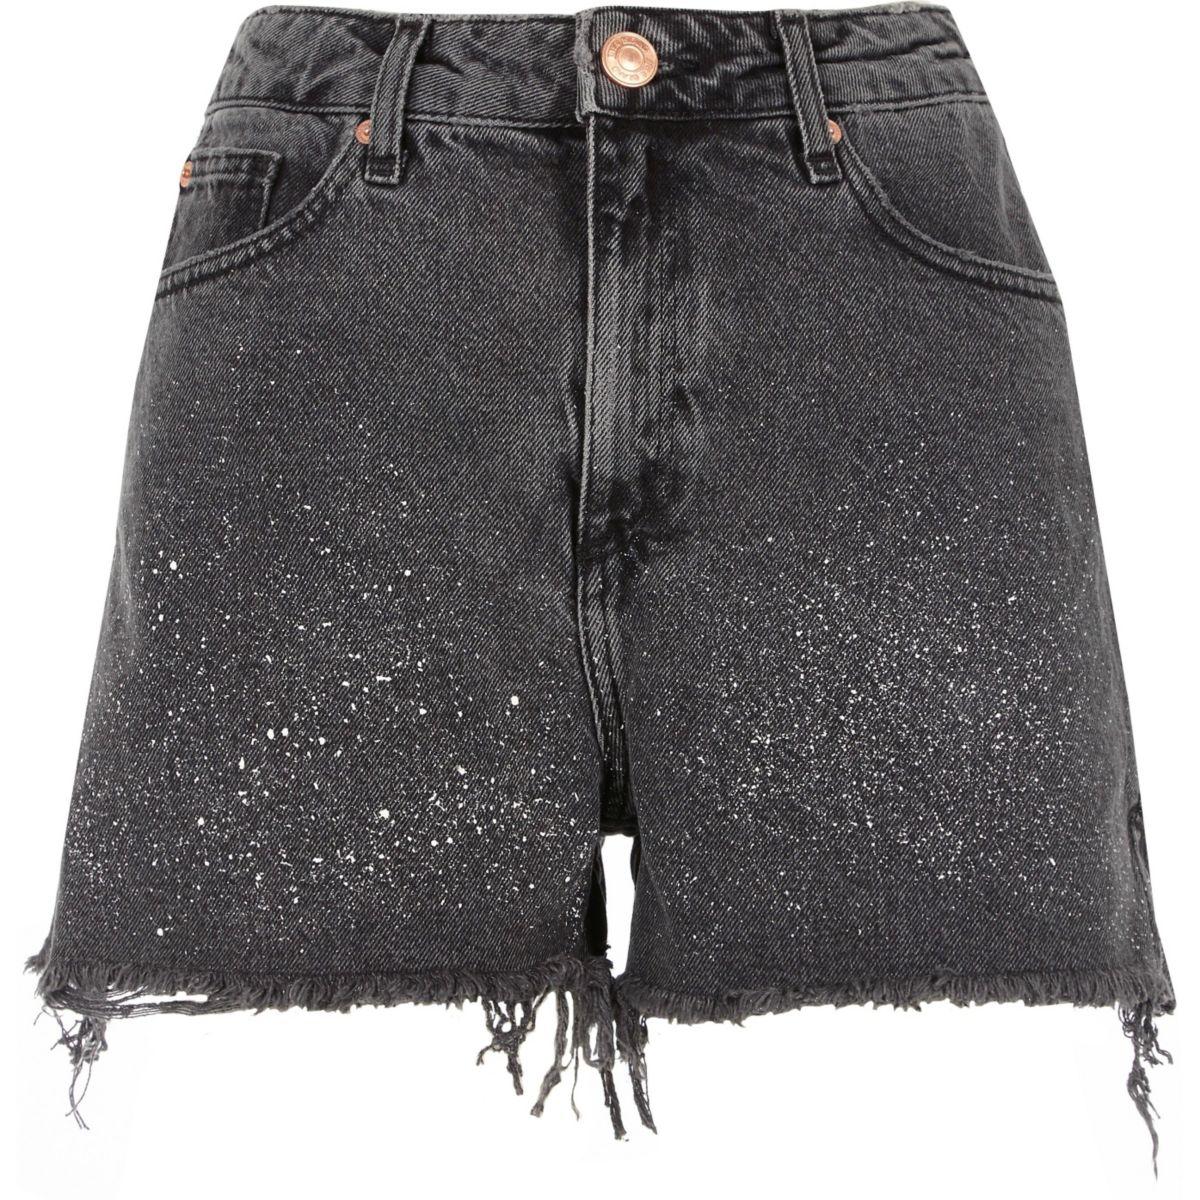 Black washed paint splatter denim shorts